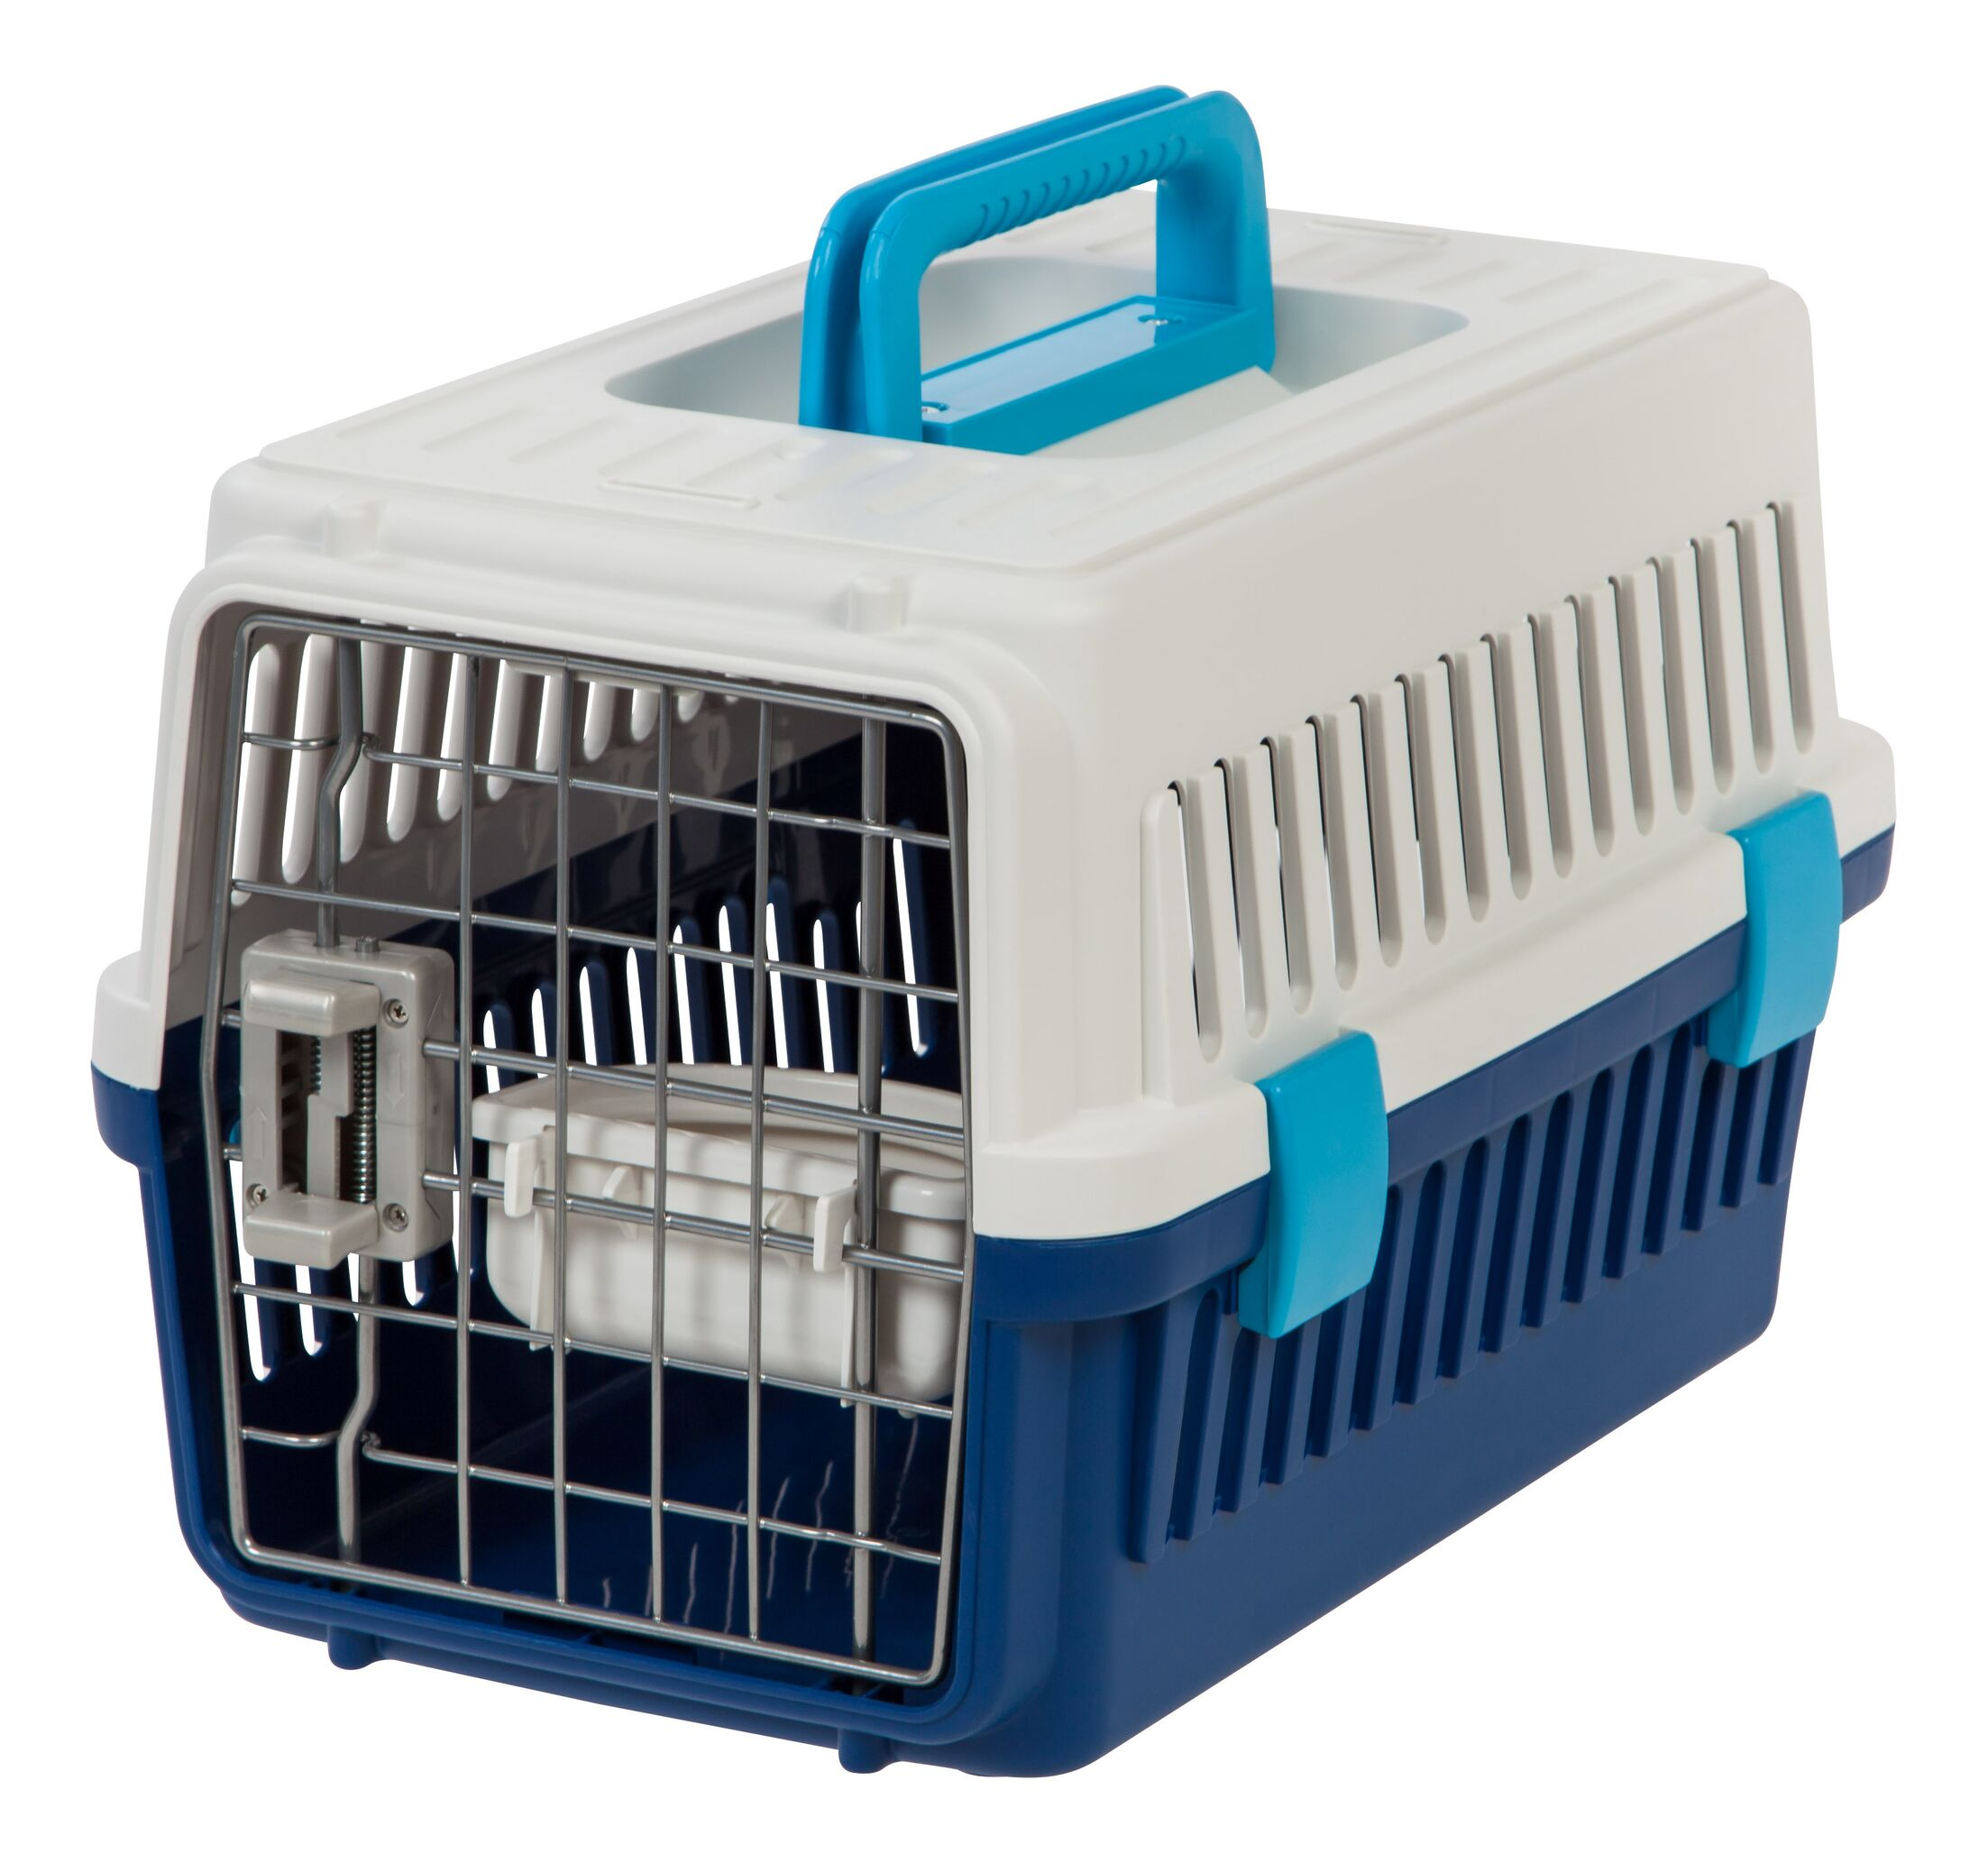 Travel Pet Carrier Carrier Size: 11.22